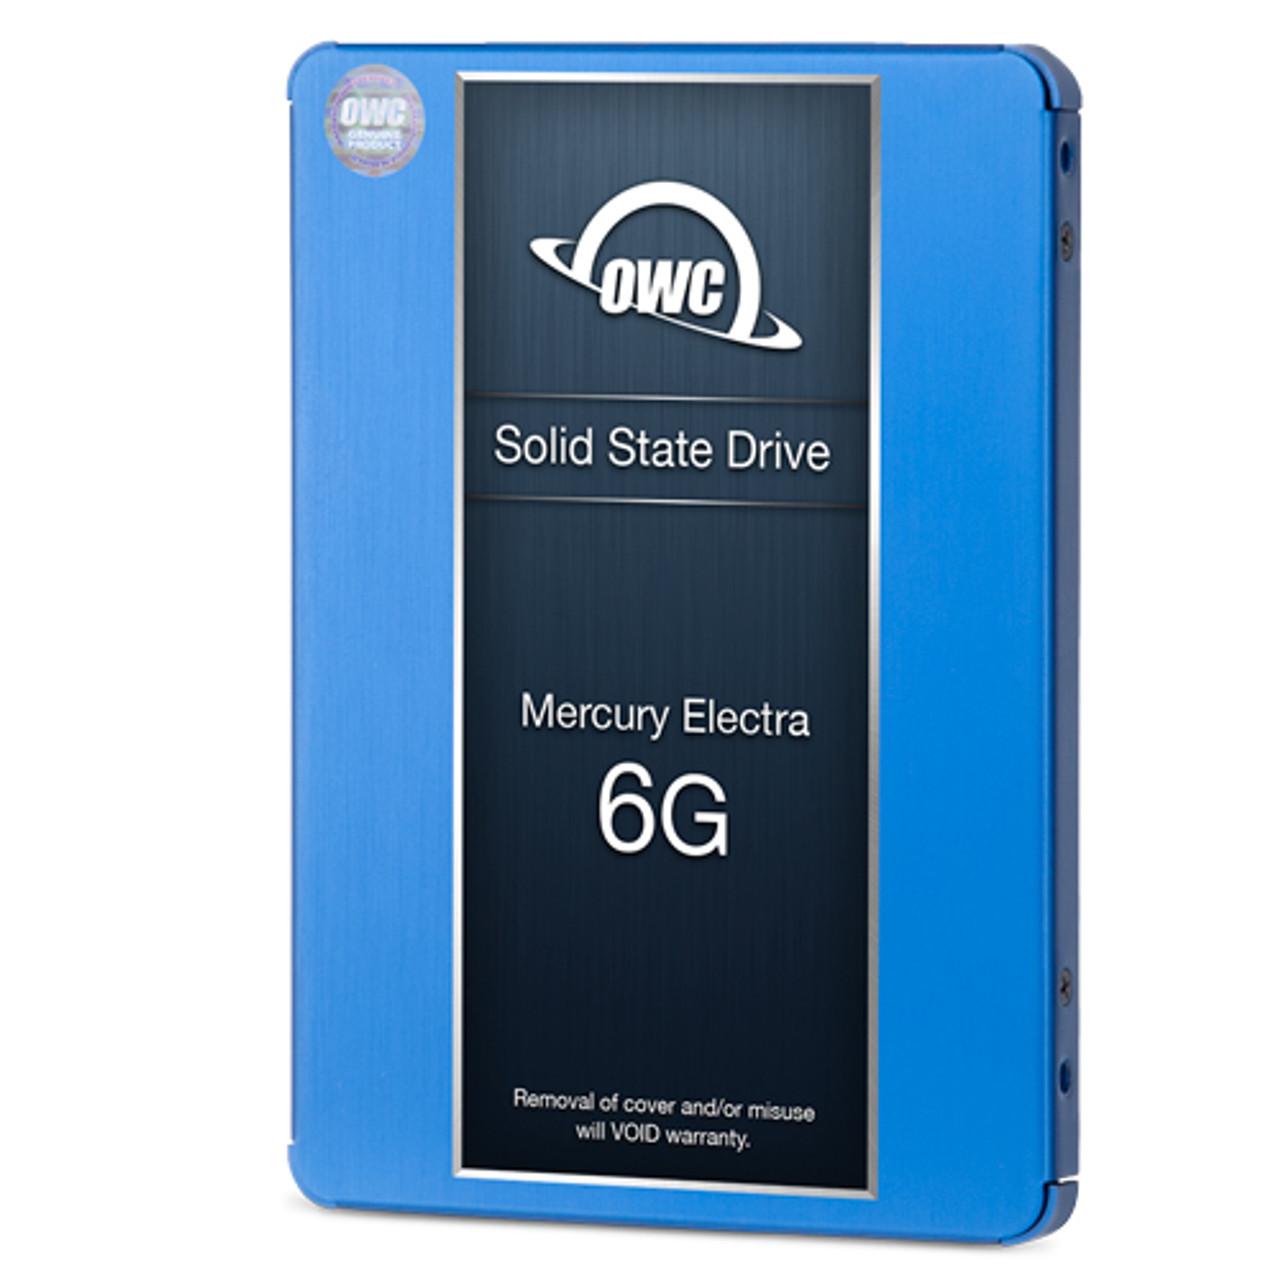 2TB OWC Mercury Electra 6G SSD and HDD DIY Bundle Kit for all iMac Mid 2011